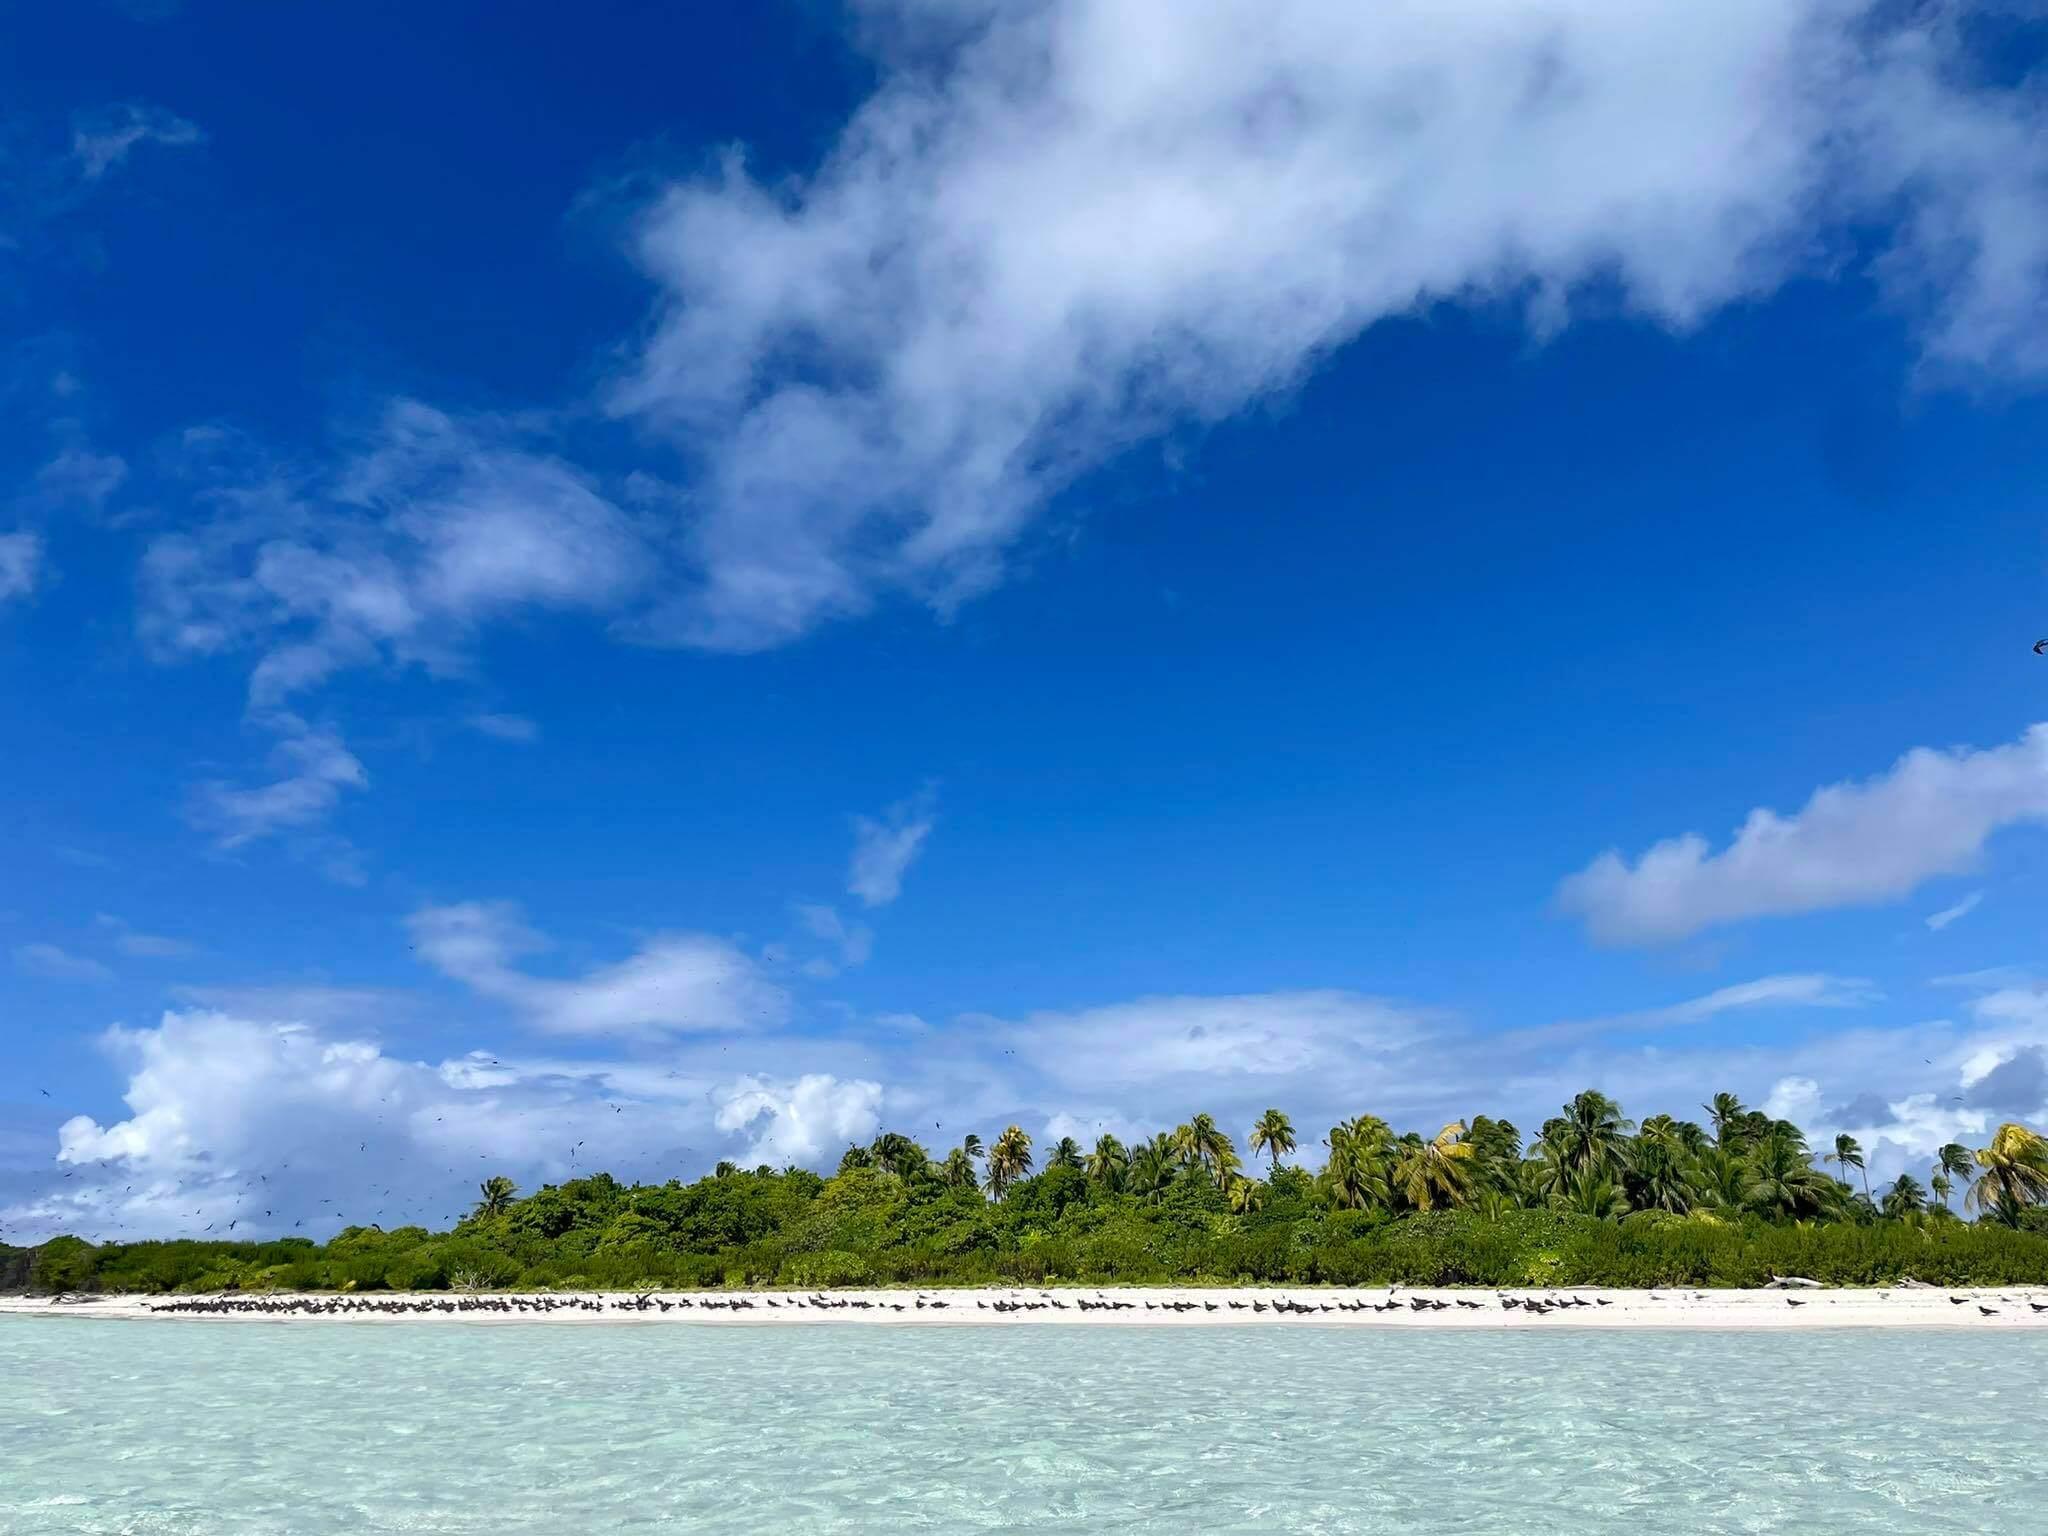 http://tahitivoileetlagon.com/wp-content/uploads/2021/07/plages-oiseaux-TETIAROA.jpg